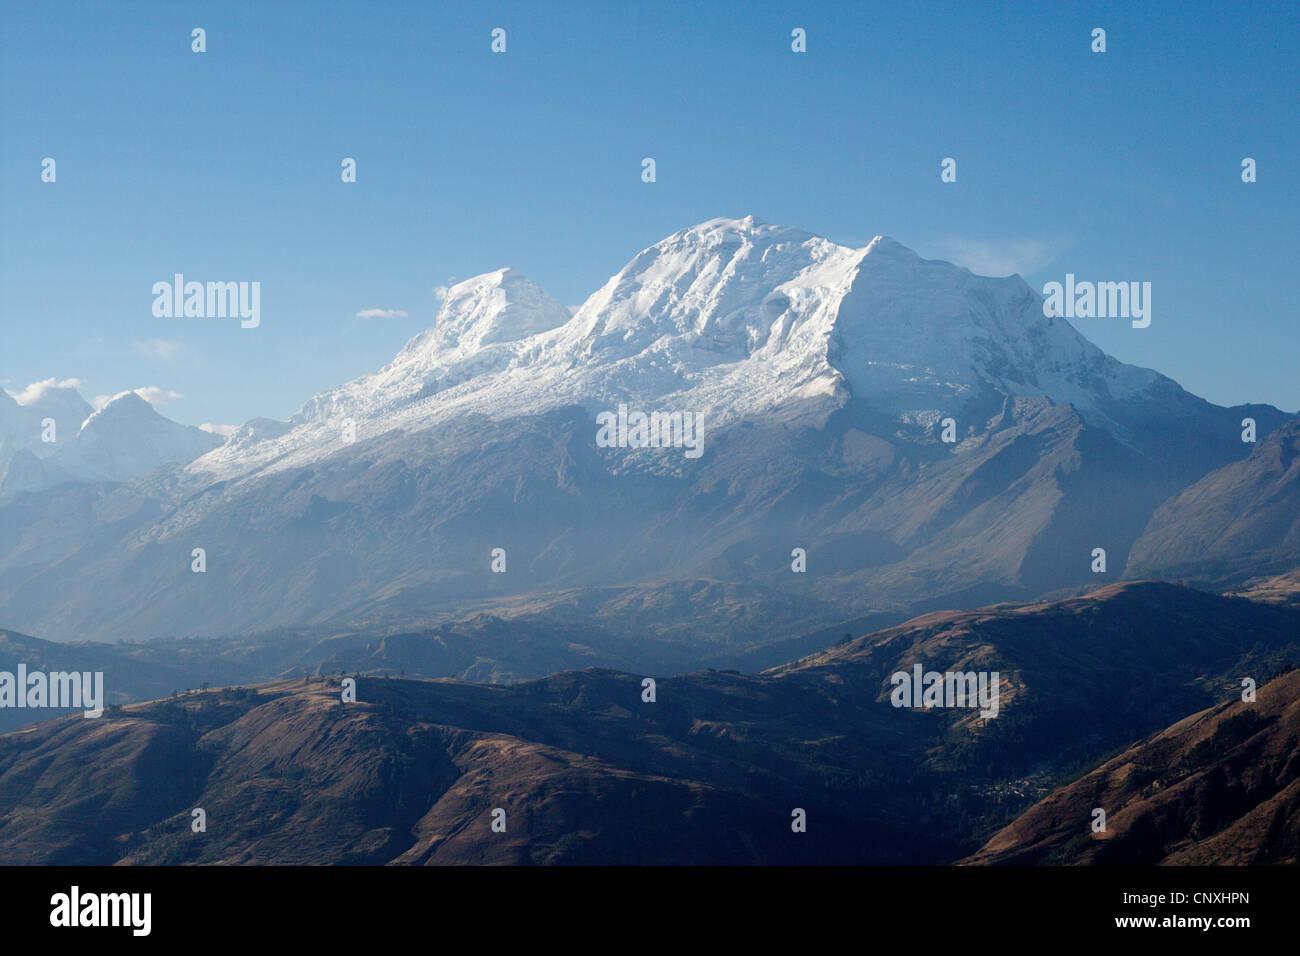 Cordillera Blanca mit den Gipfel des Mount Huascar n (6768 m), Peru Stockbild